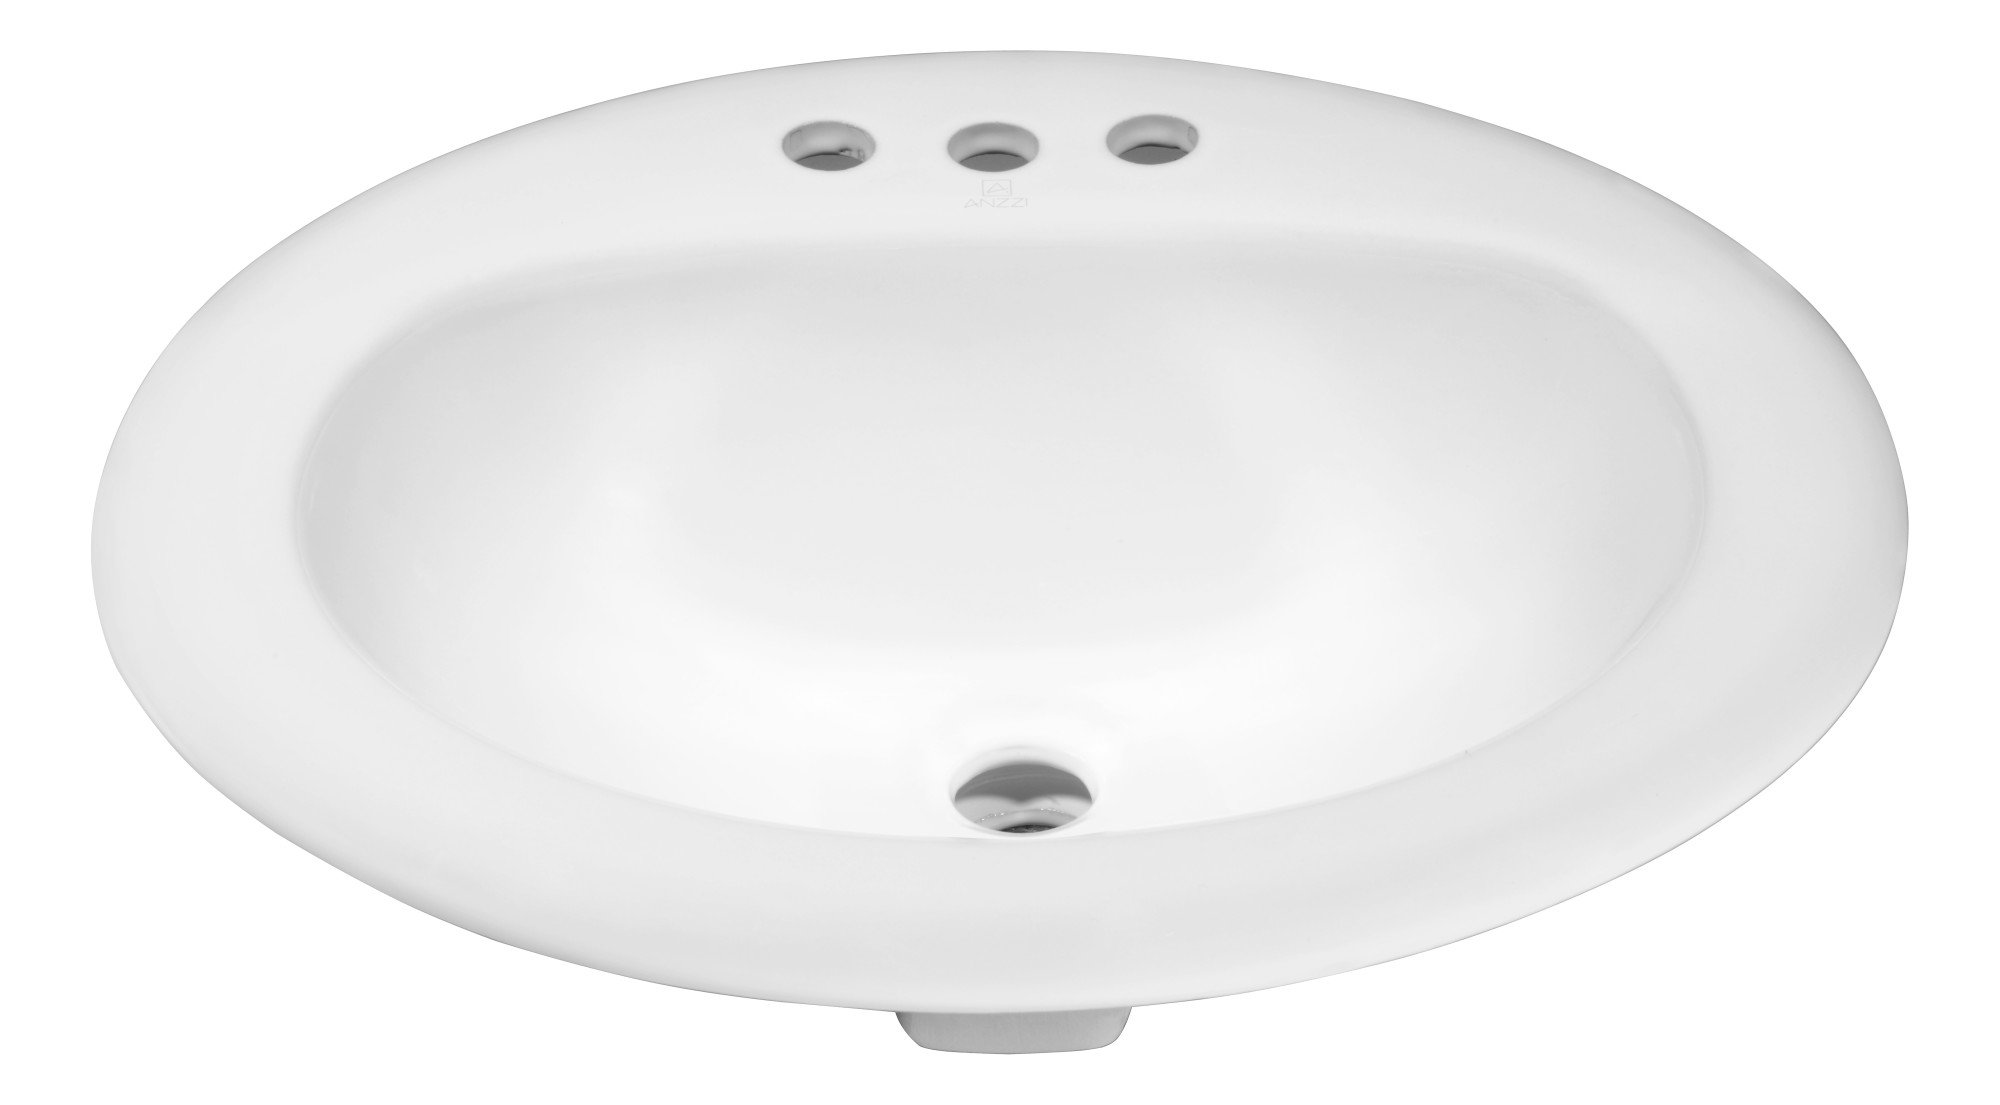 20.5'' Ceramic Drop-In Sink - Glossy White - Cadenza Series LS-AZ097 - ANZZI by ANZZI (Image #1)